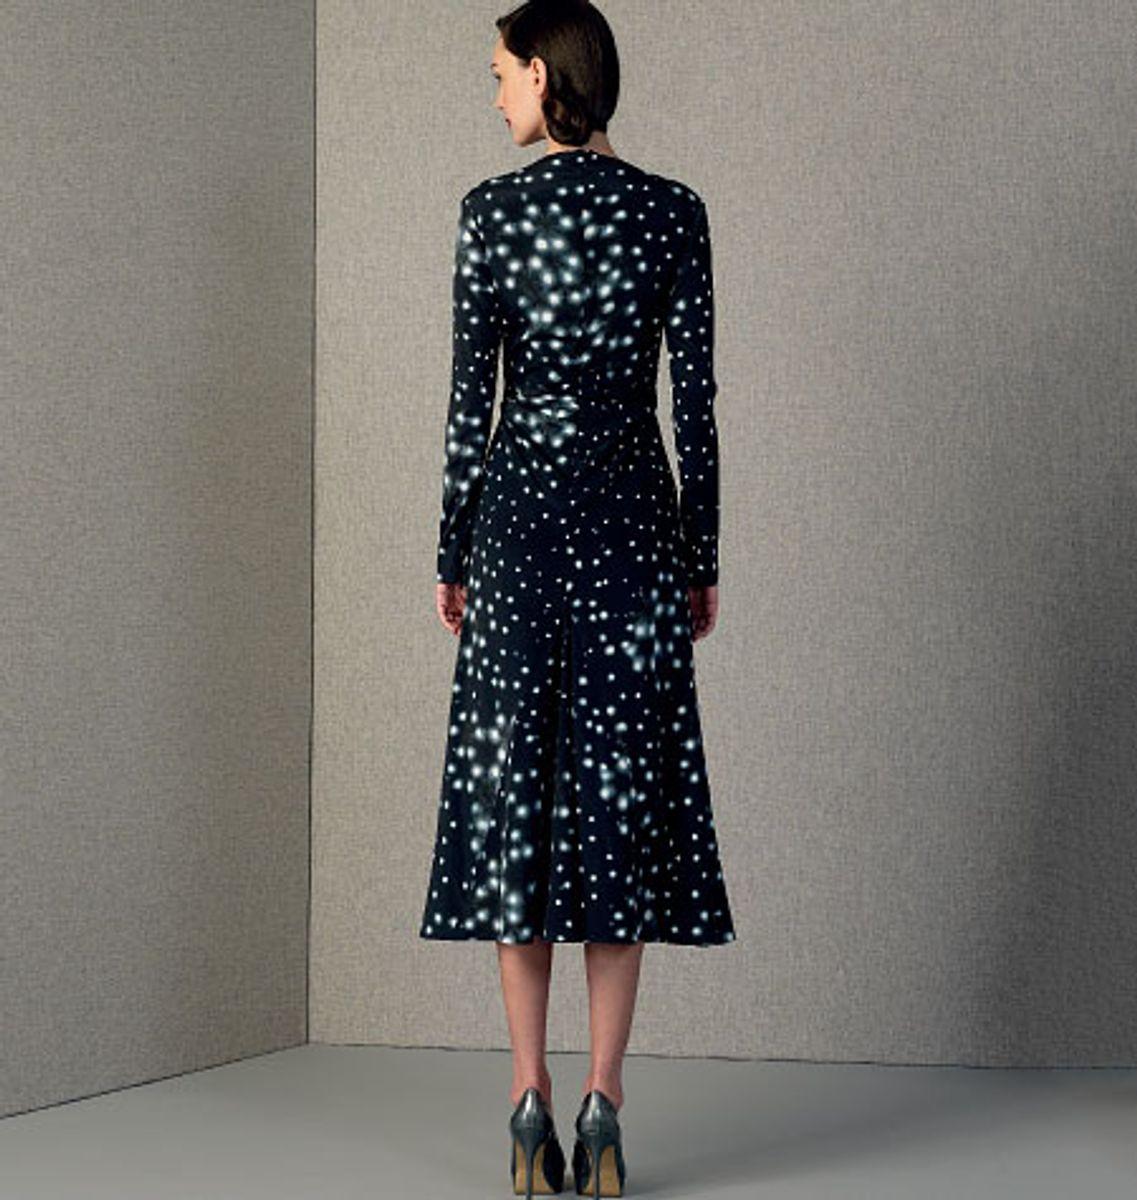 Patron de robe - Vogue 1406